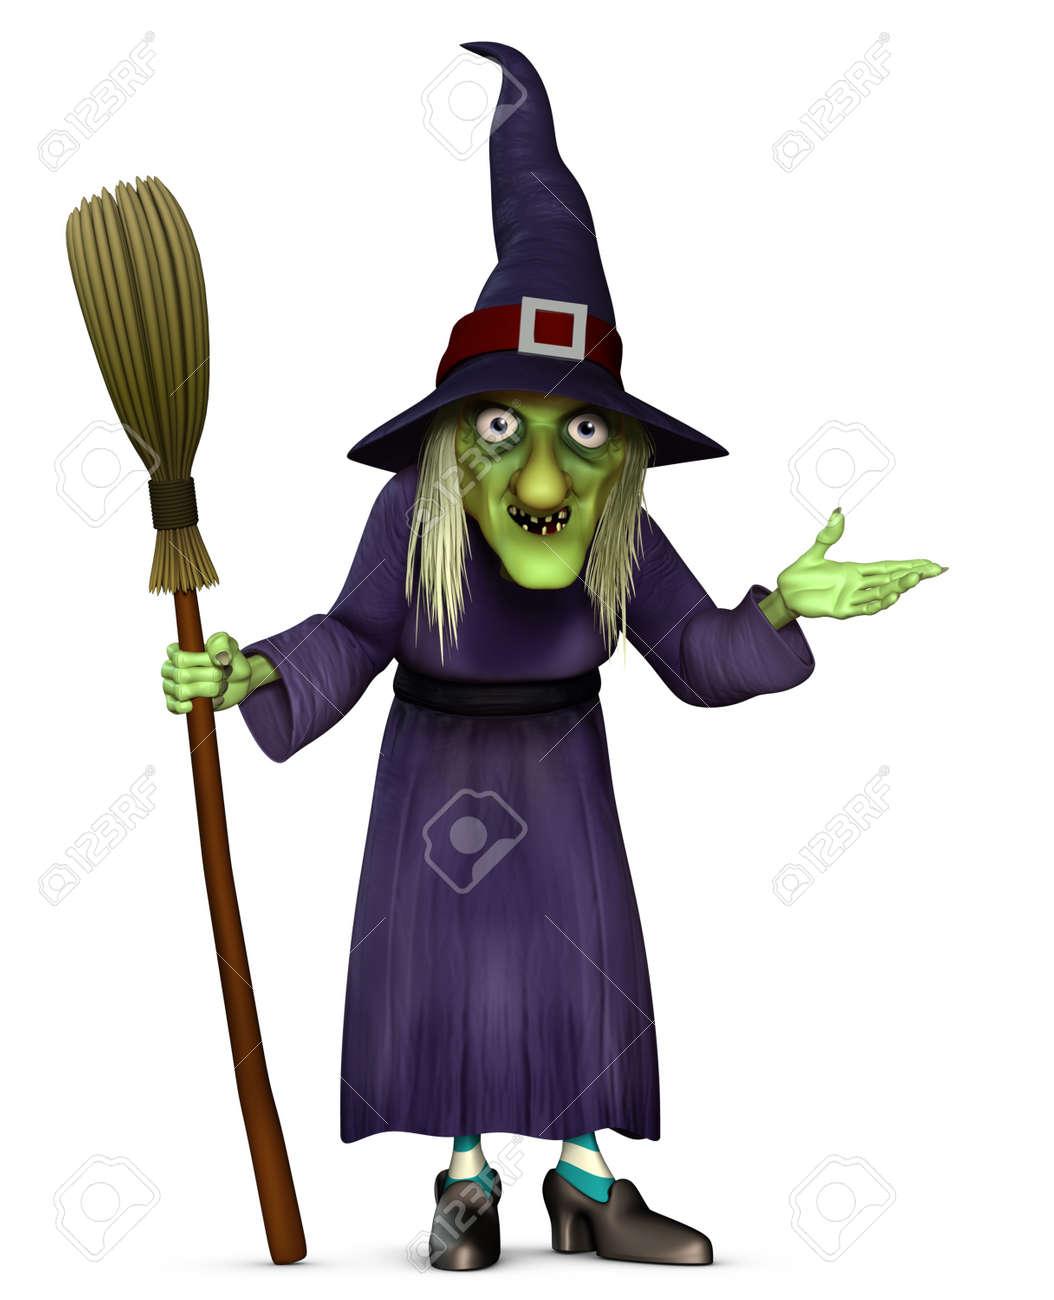 3d cartoon halloween harridan with broom stock photo 15626243 - Halloween Witch Cartoon